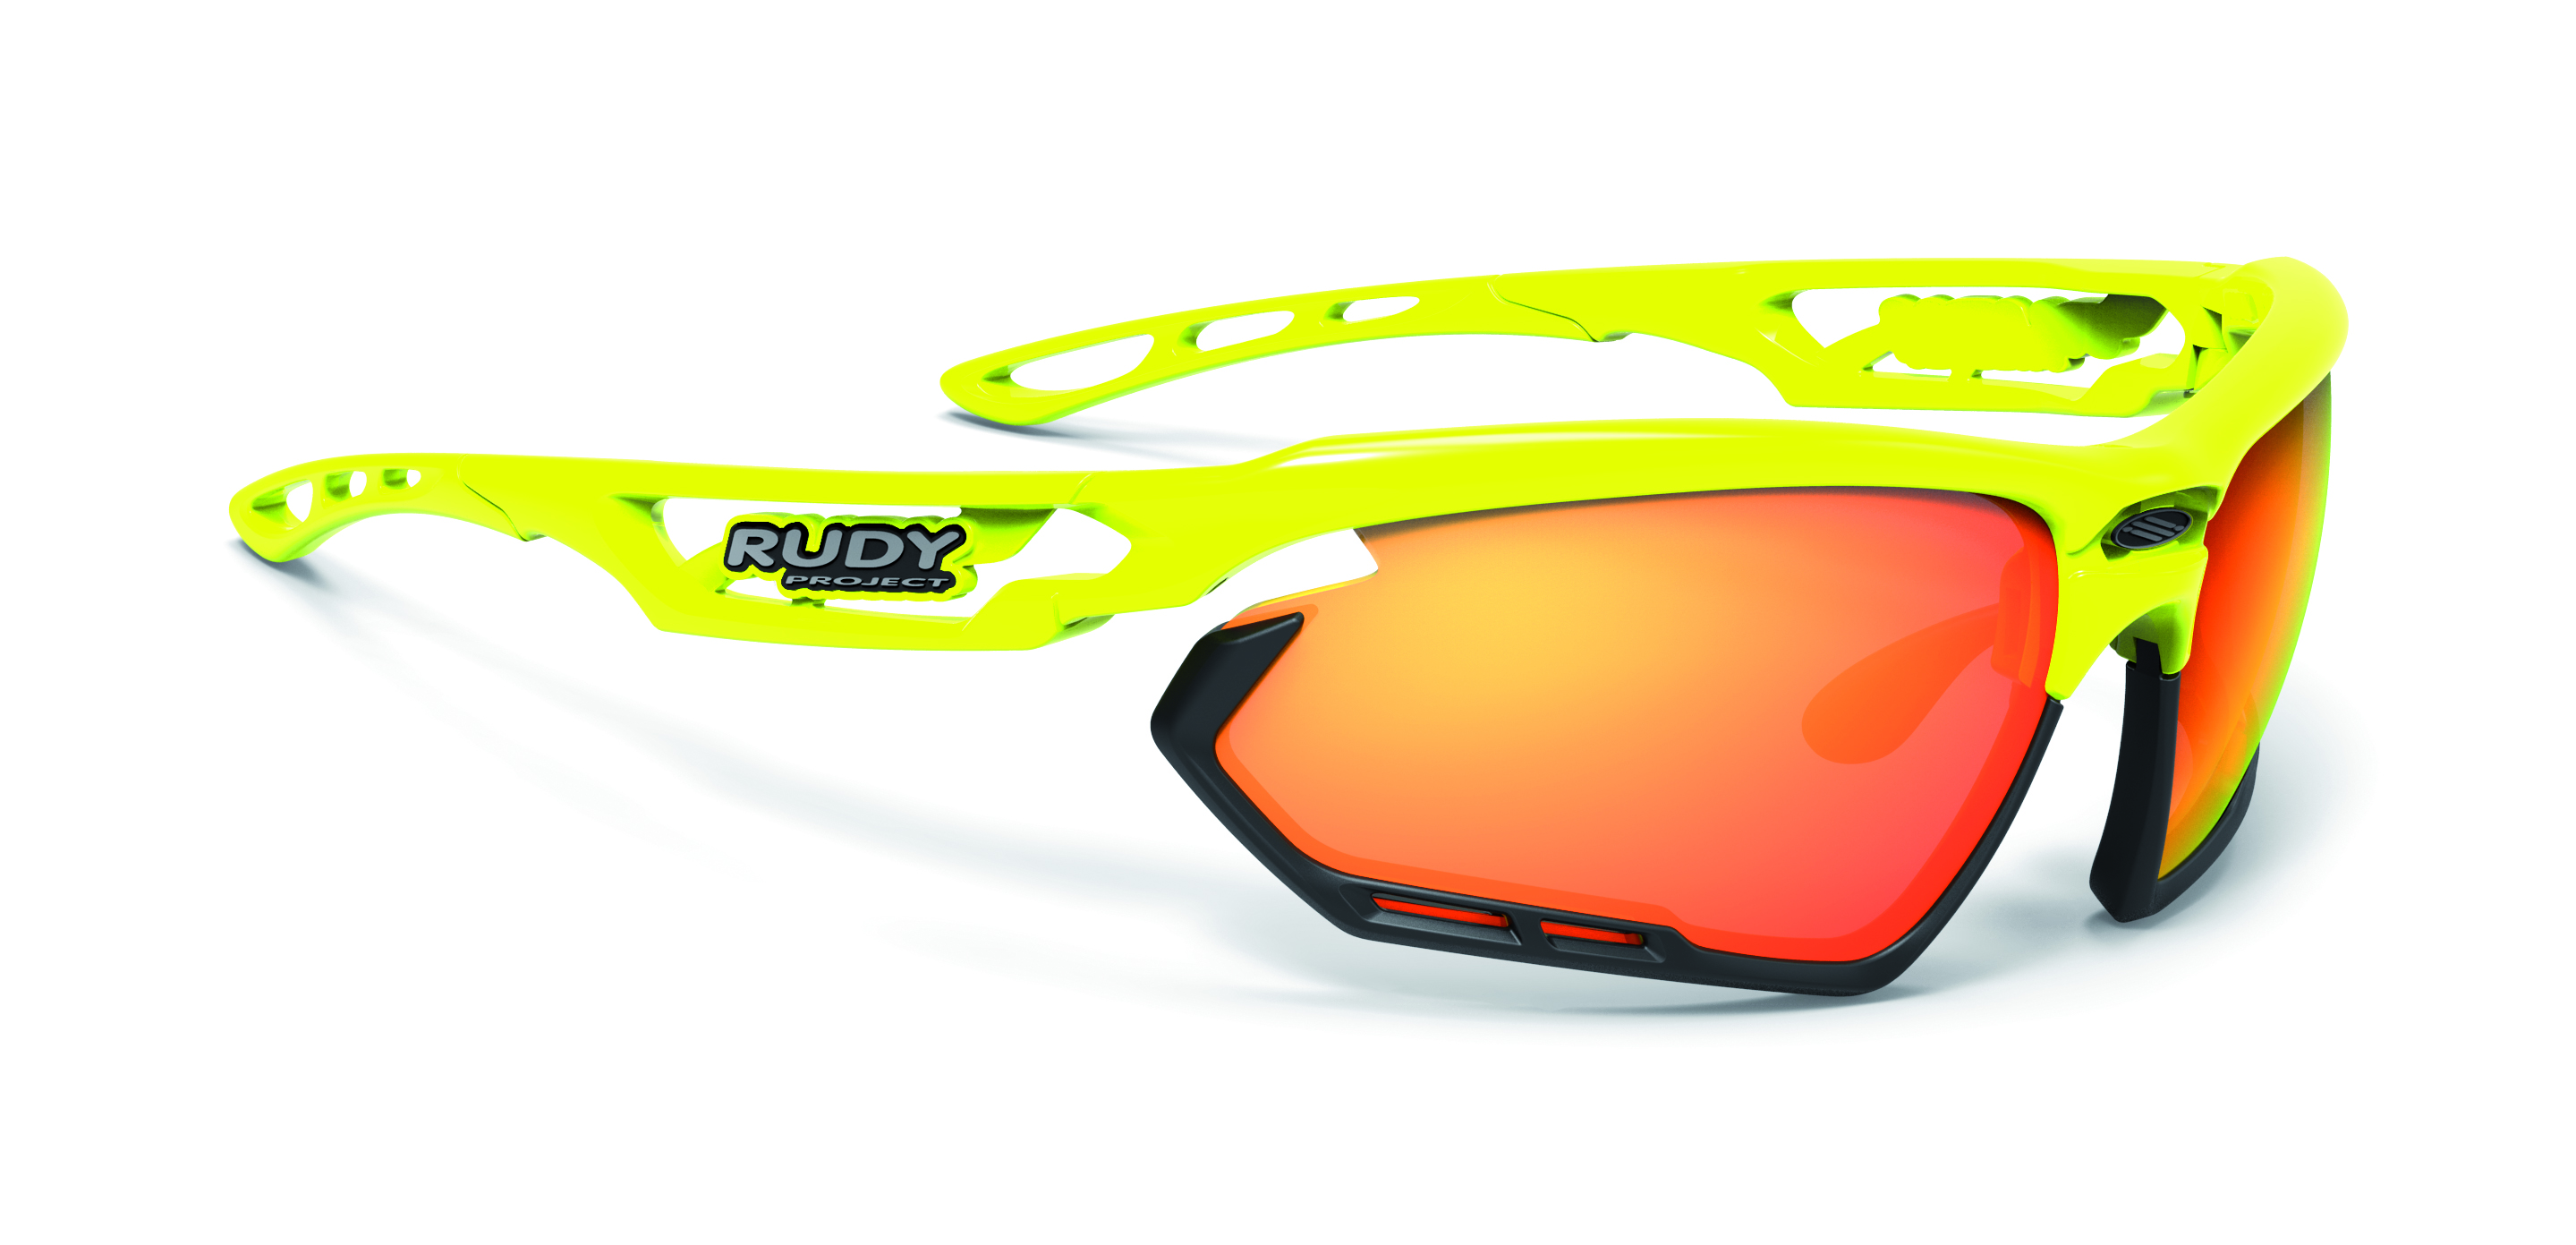 Rudy Project Brille Fotonyk Neongul Gloss Multilaser Orange NEONGUL | Glasses